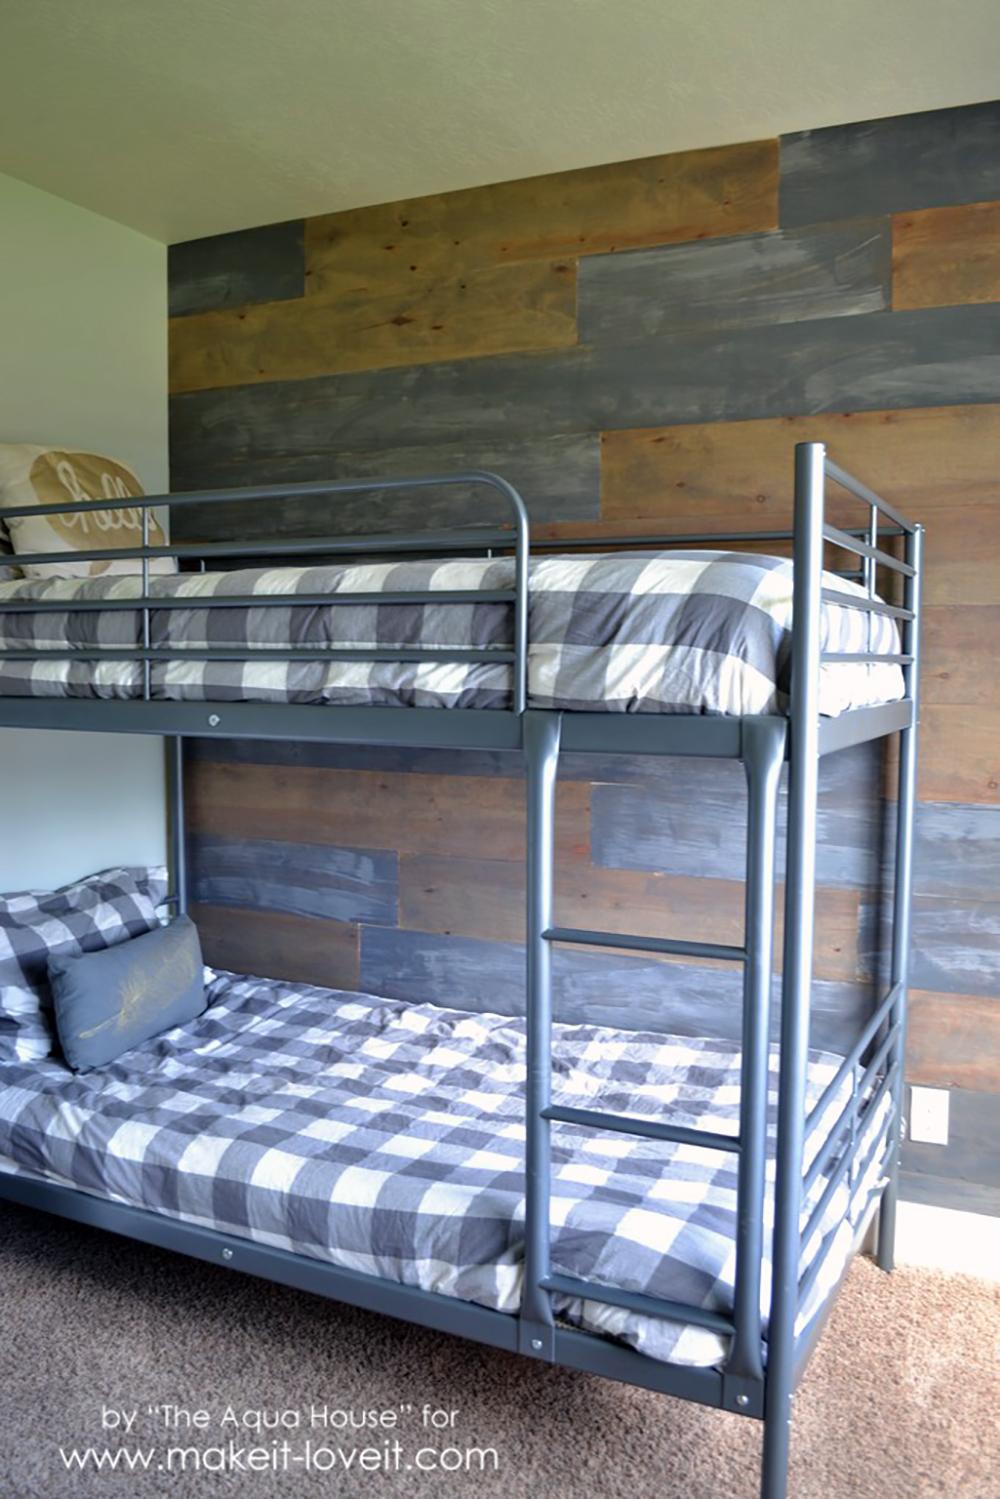 How to Make a Faux Barn Wood Wall | via makeit-loveit.com